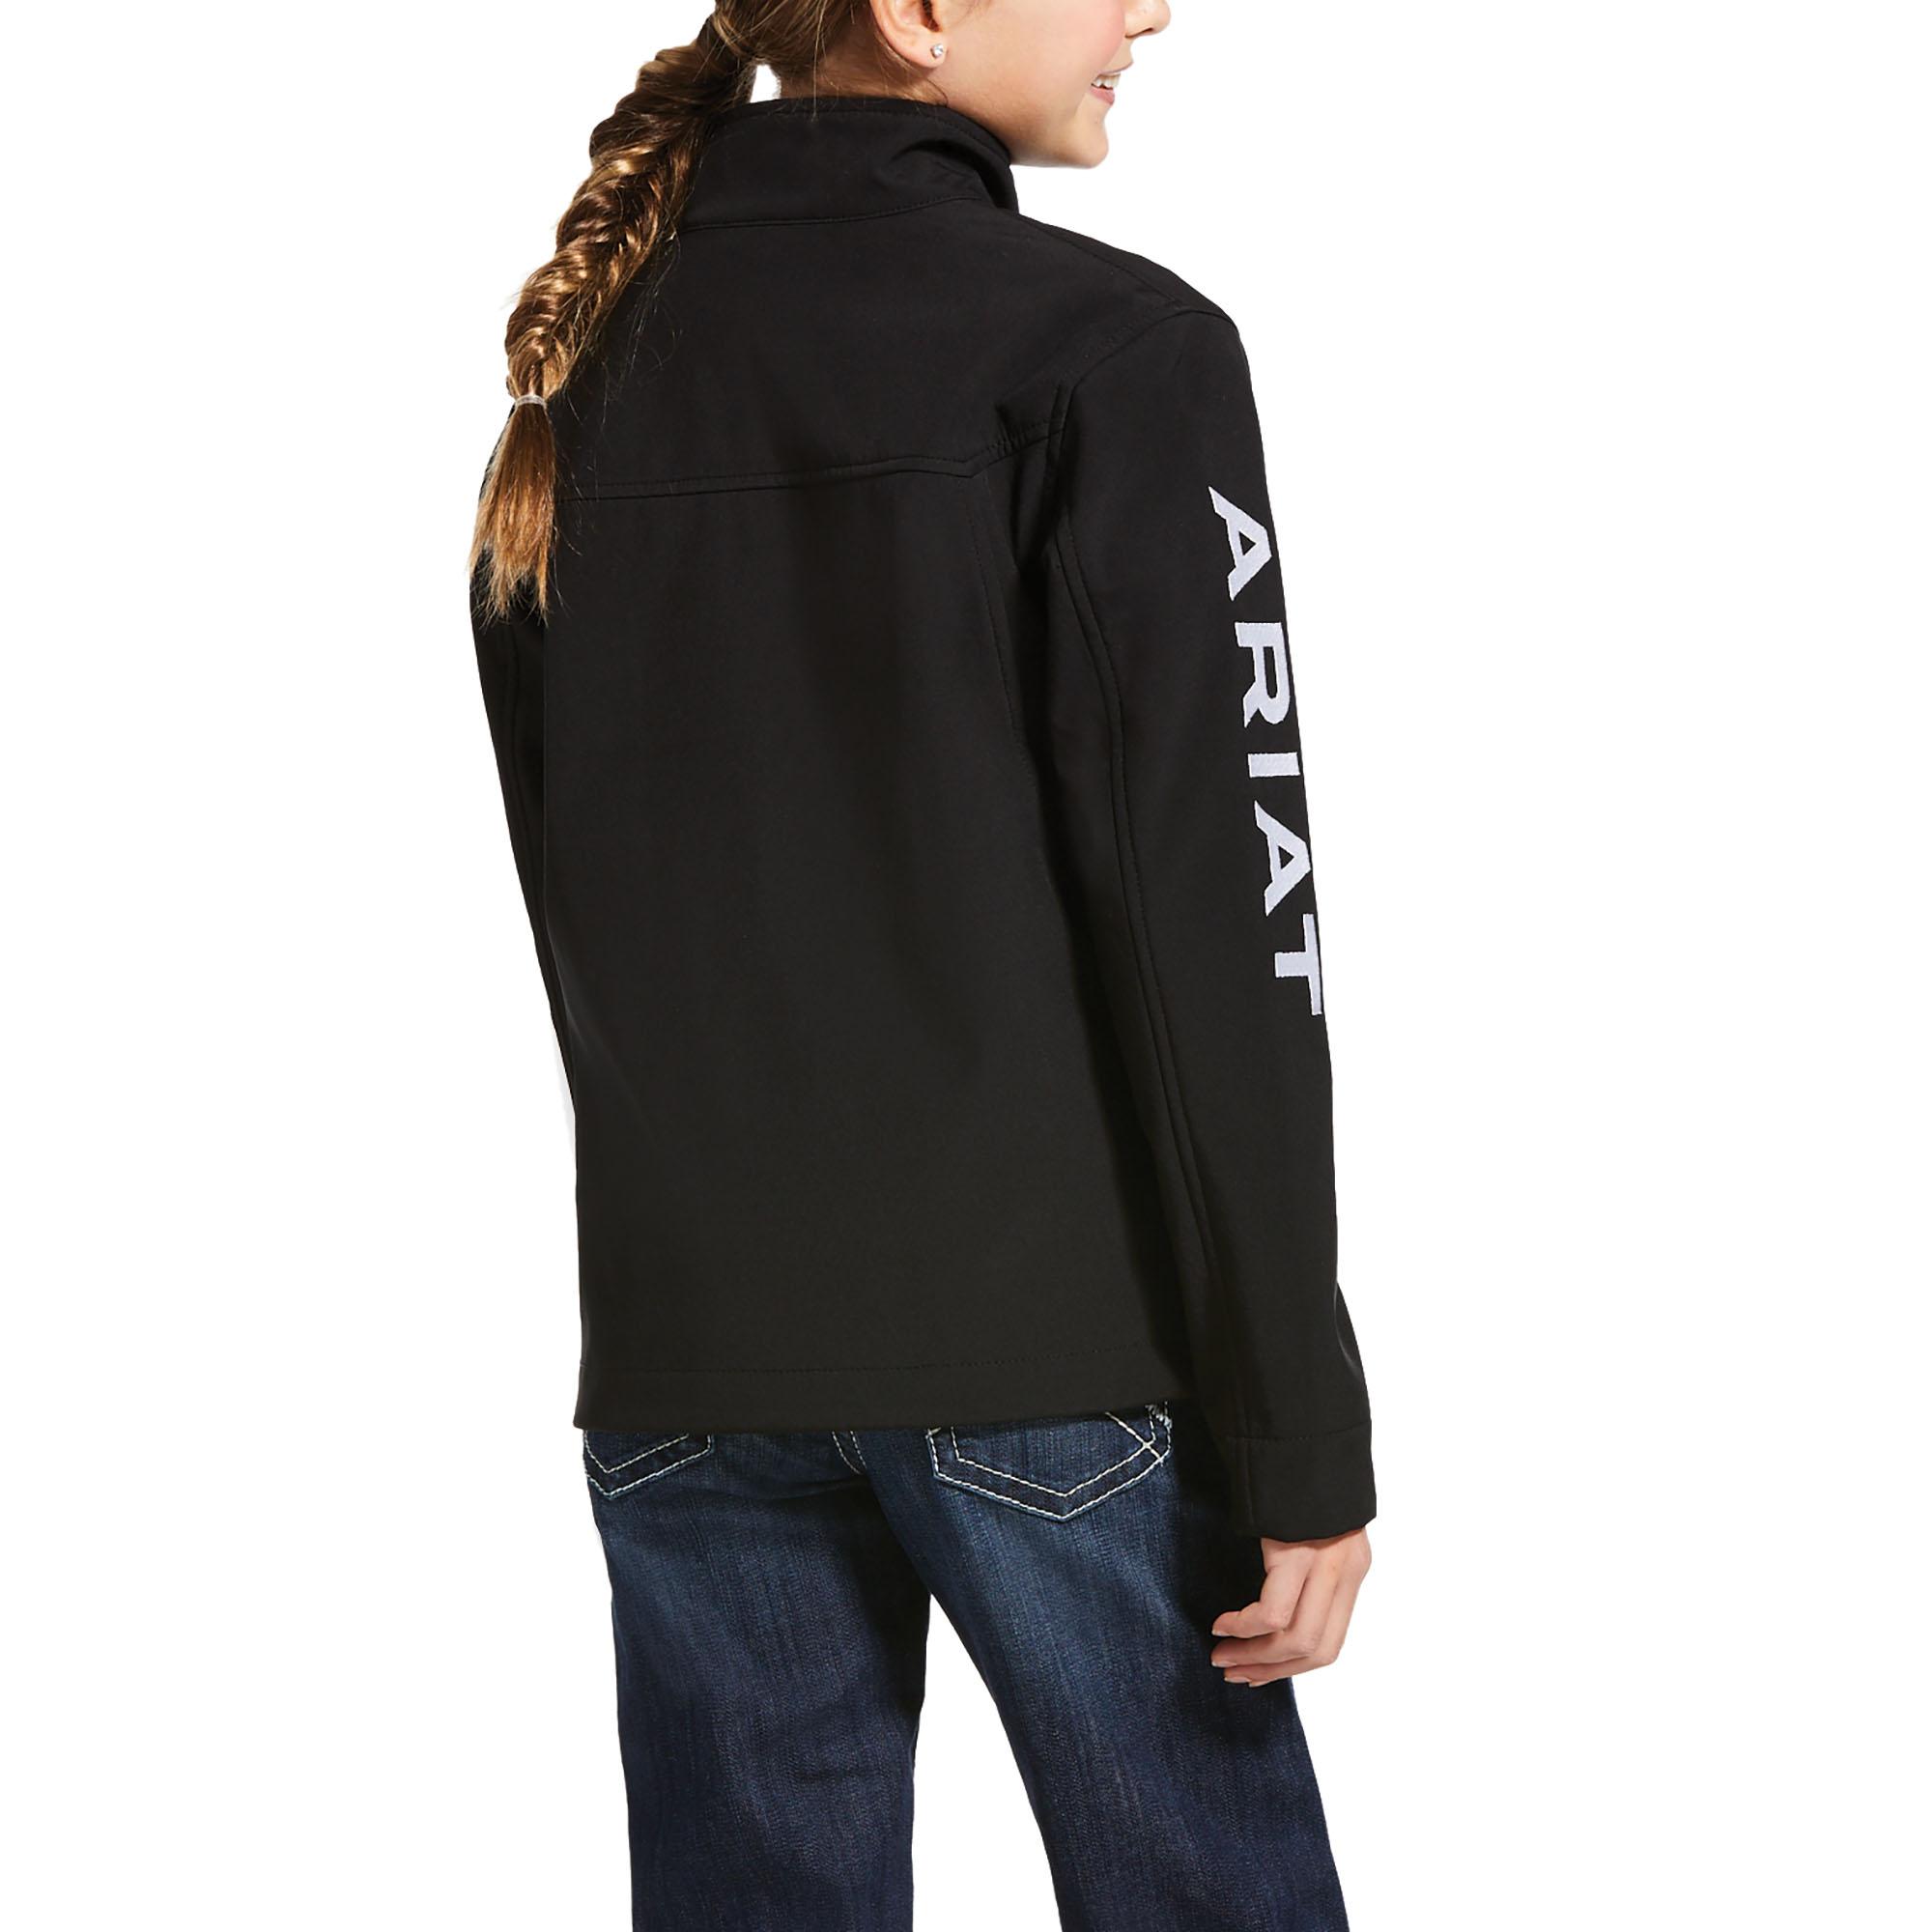 Ariat Kids New Team Softshell Jacket